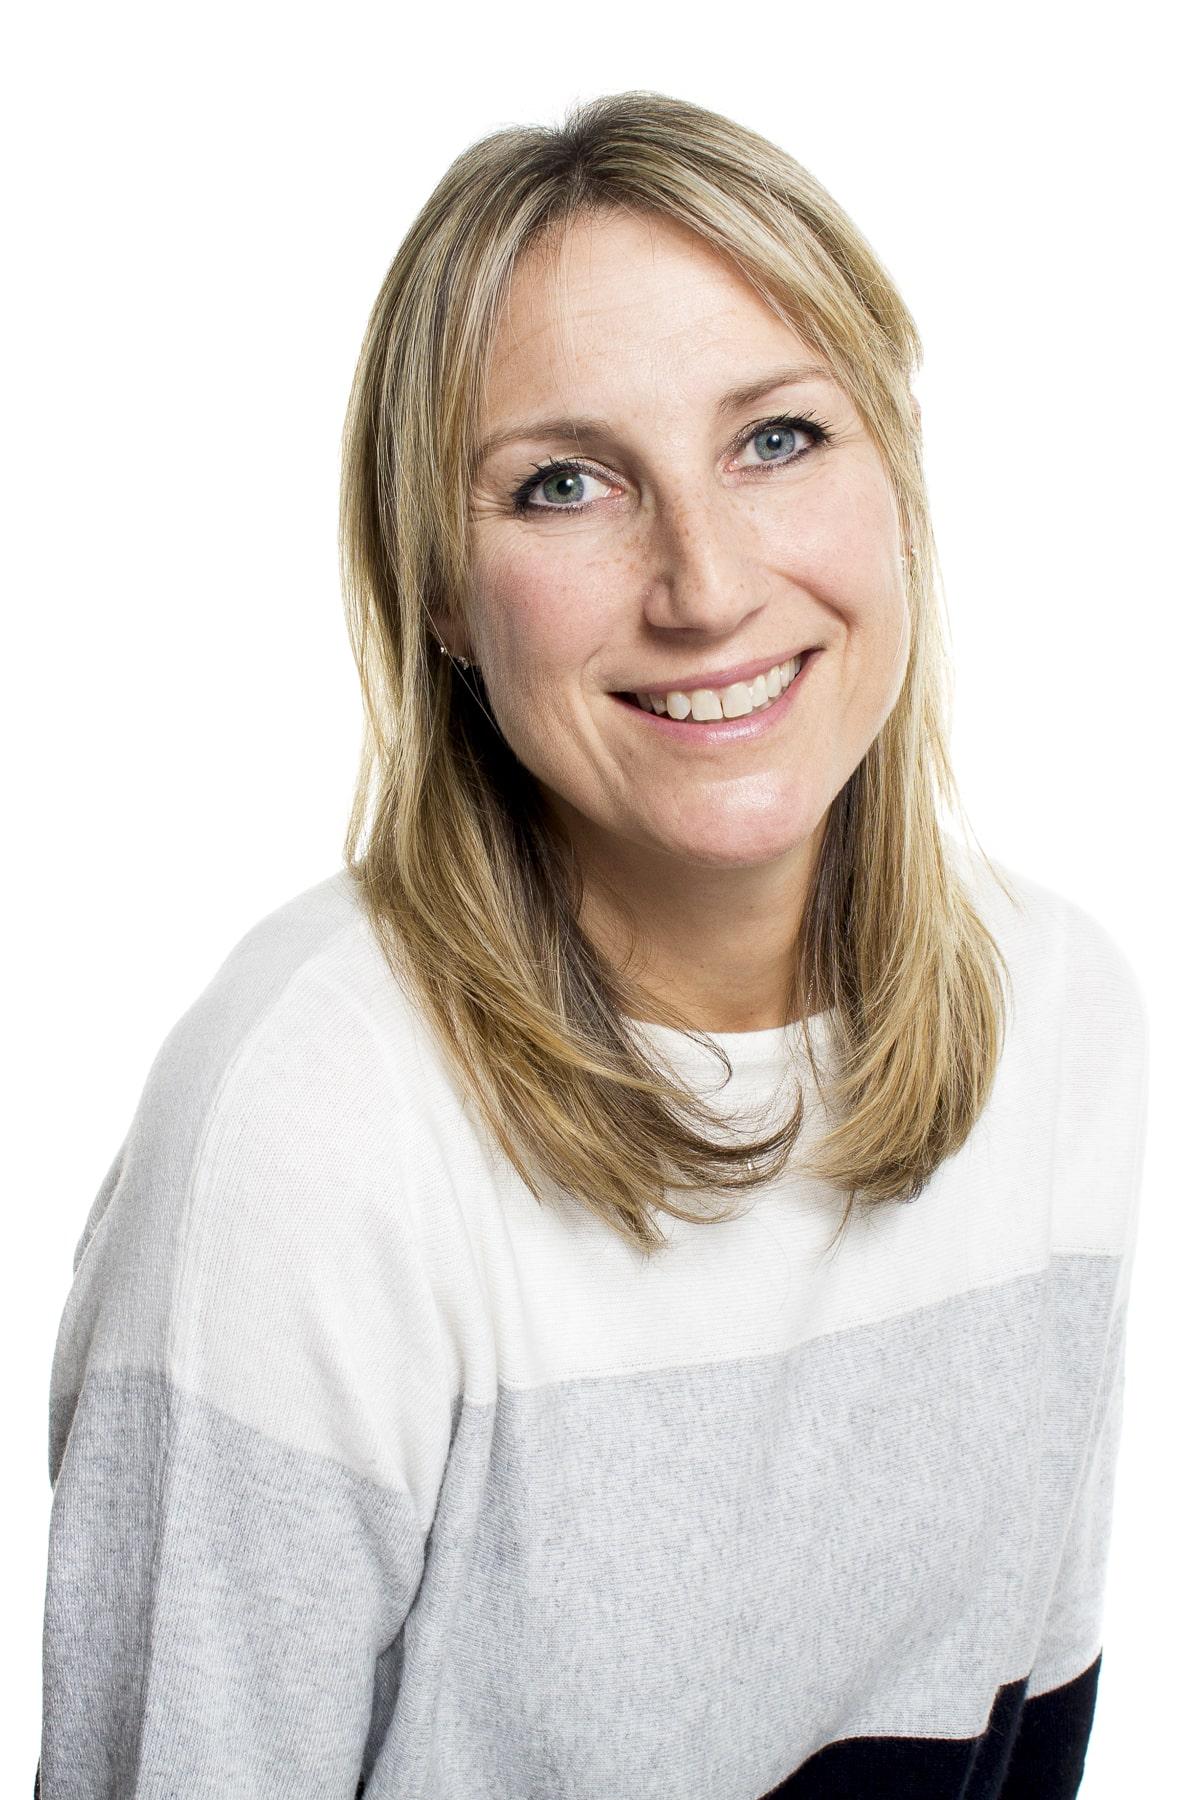 Claudia Strauss, Managing Director of MetrixLab UK